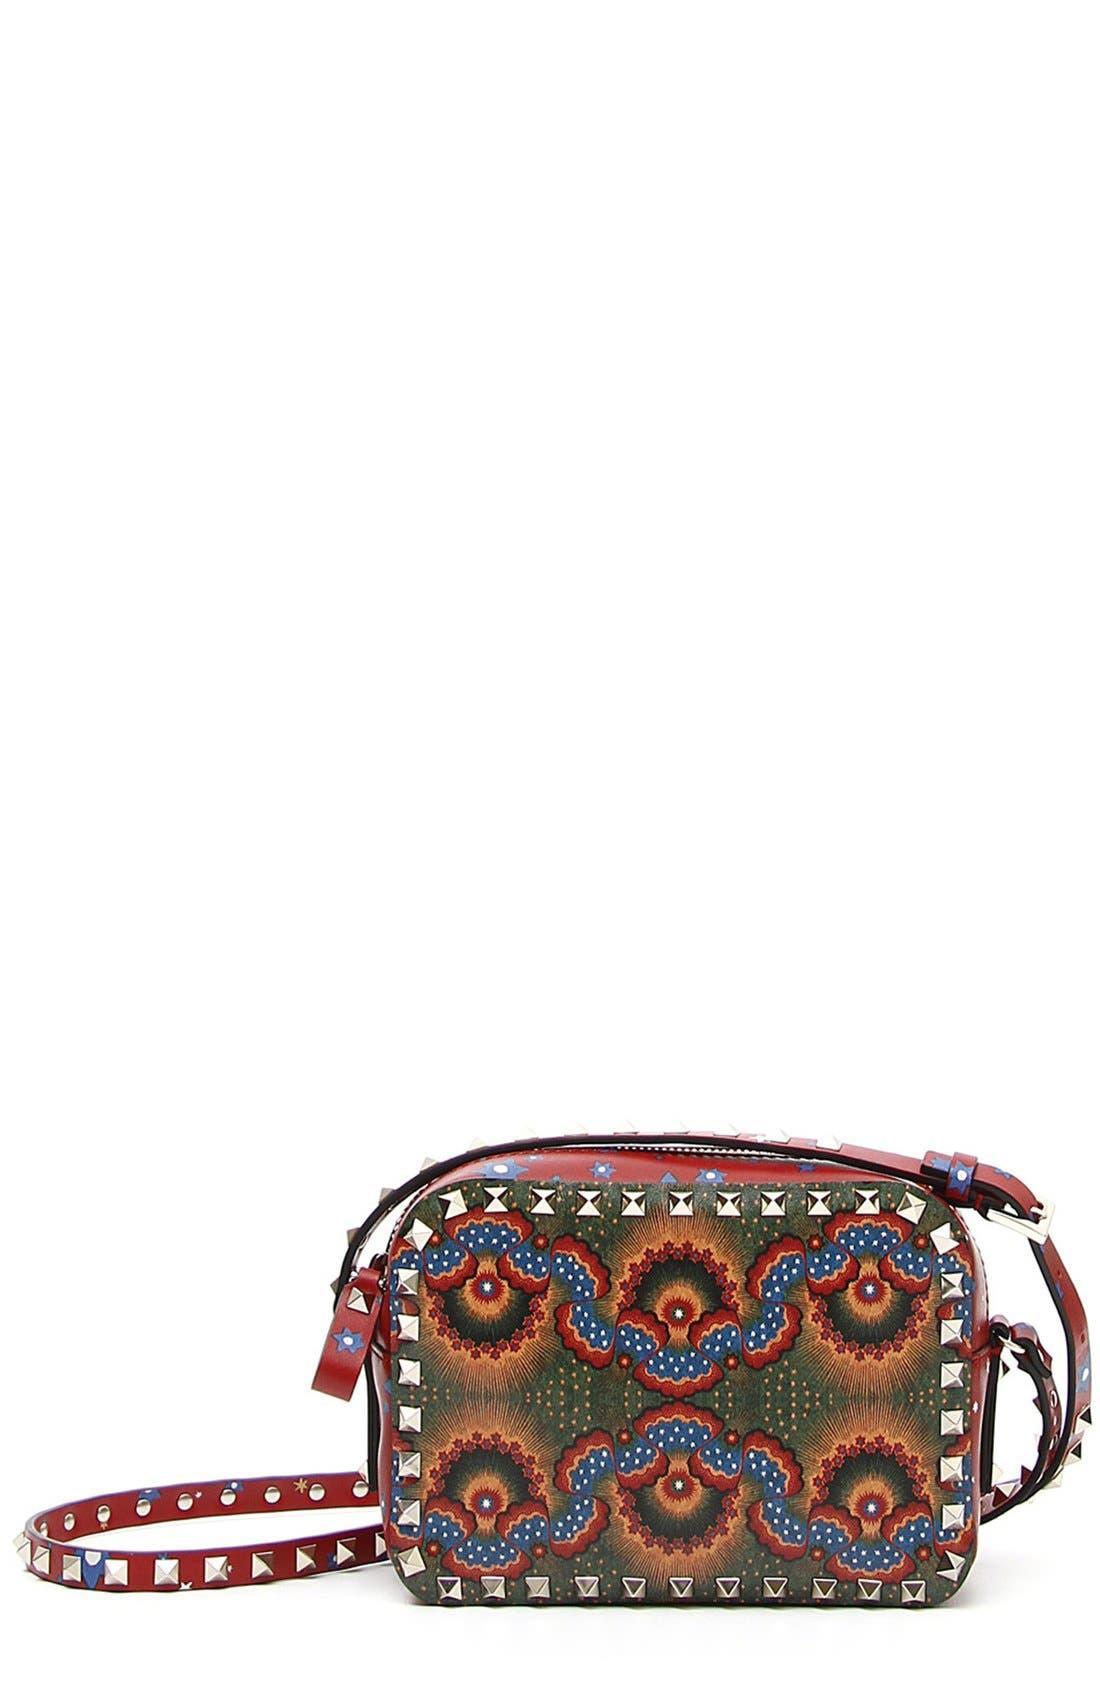 Alternate Image 1 Selected - Valentino 'Rockstud - Enchanted Wonderland' Calfskin Leather Camera Crossbody Bag